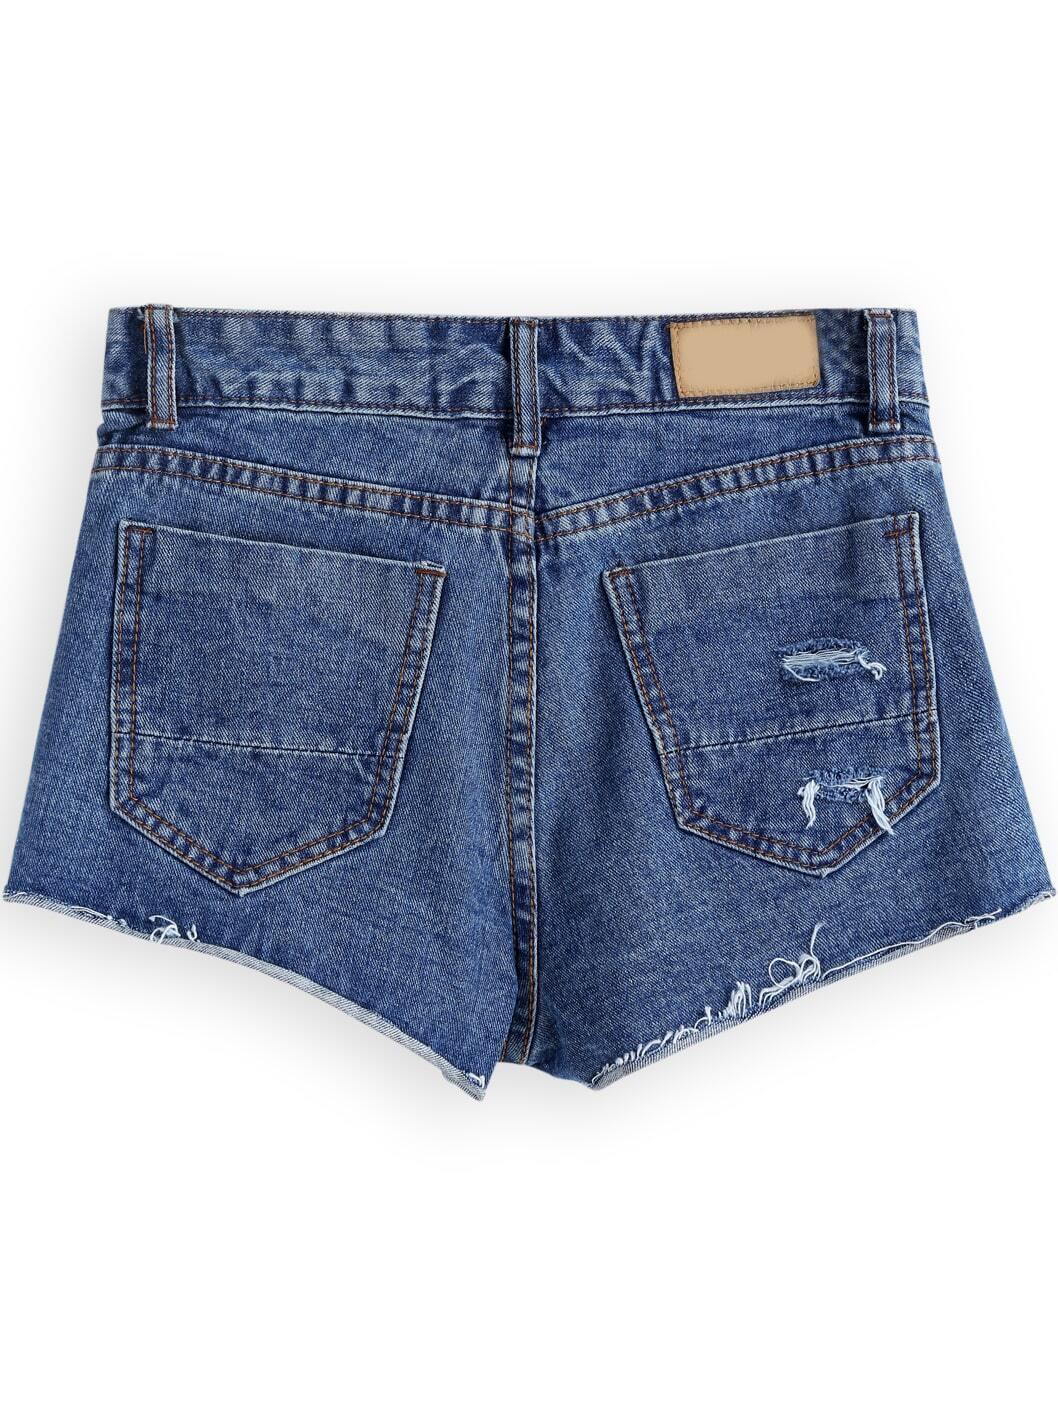 Blue Low Waist Ripped Denim Shorts -SheIn(Sheinside)